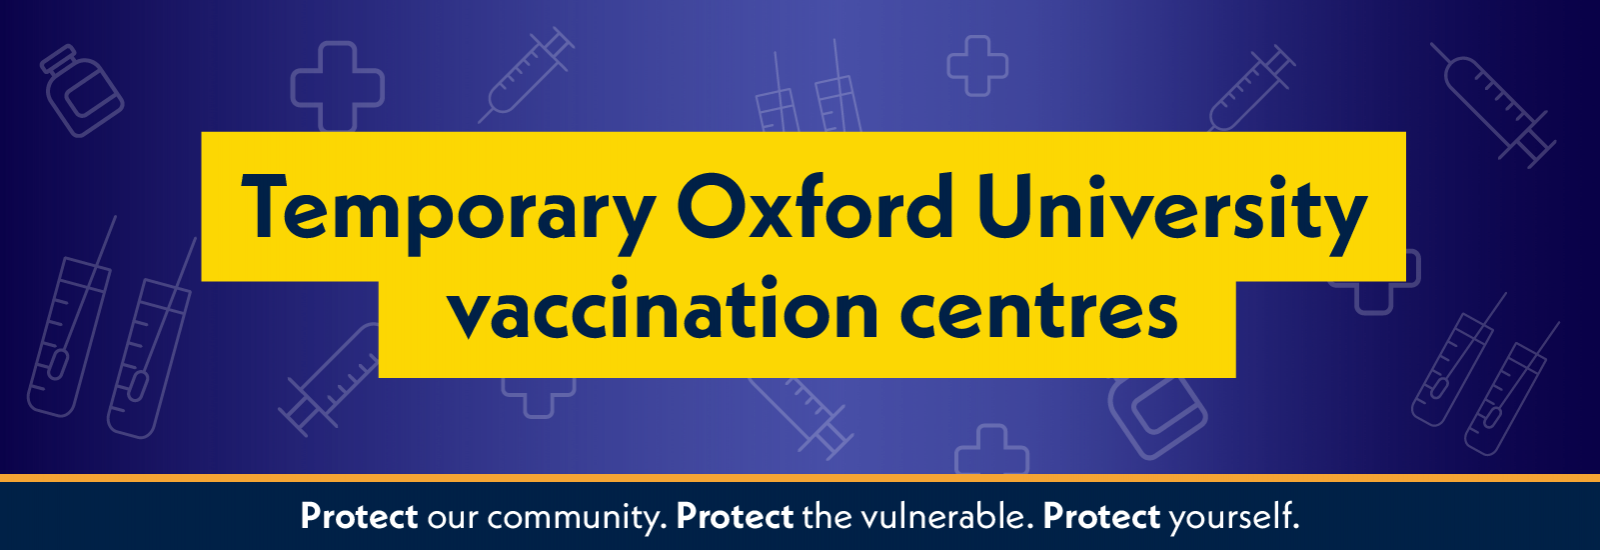 Temporary Oxford University vaccination centres